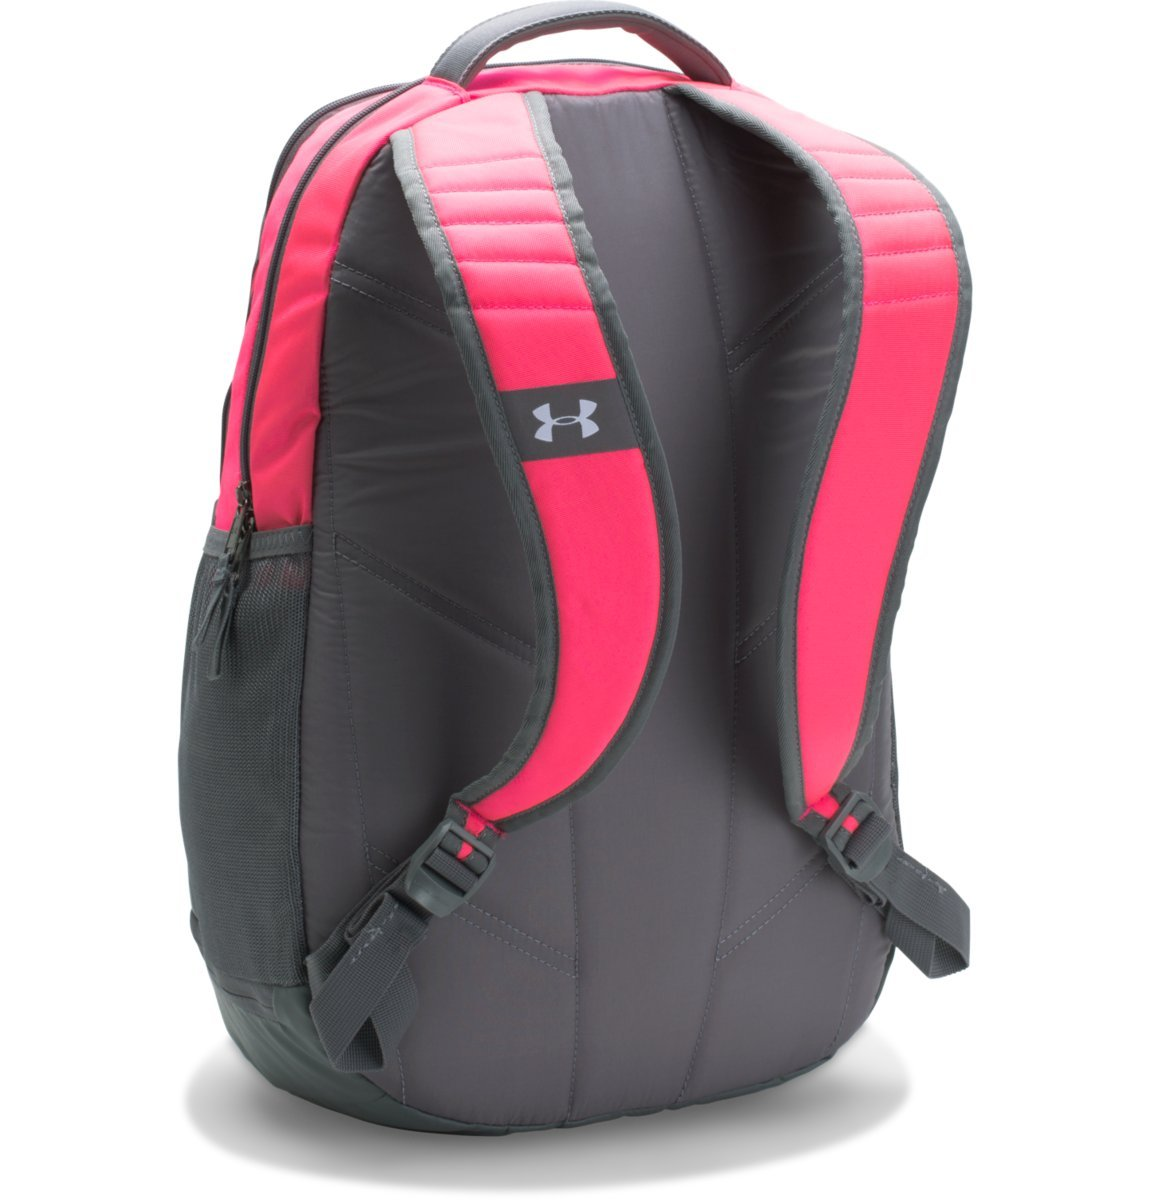 Galleon - Under Armour UA Hustle 3.0 Backpack OSFA PENTA PINK 227a702a4d